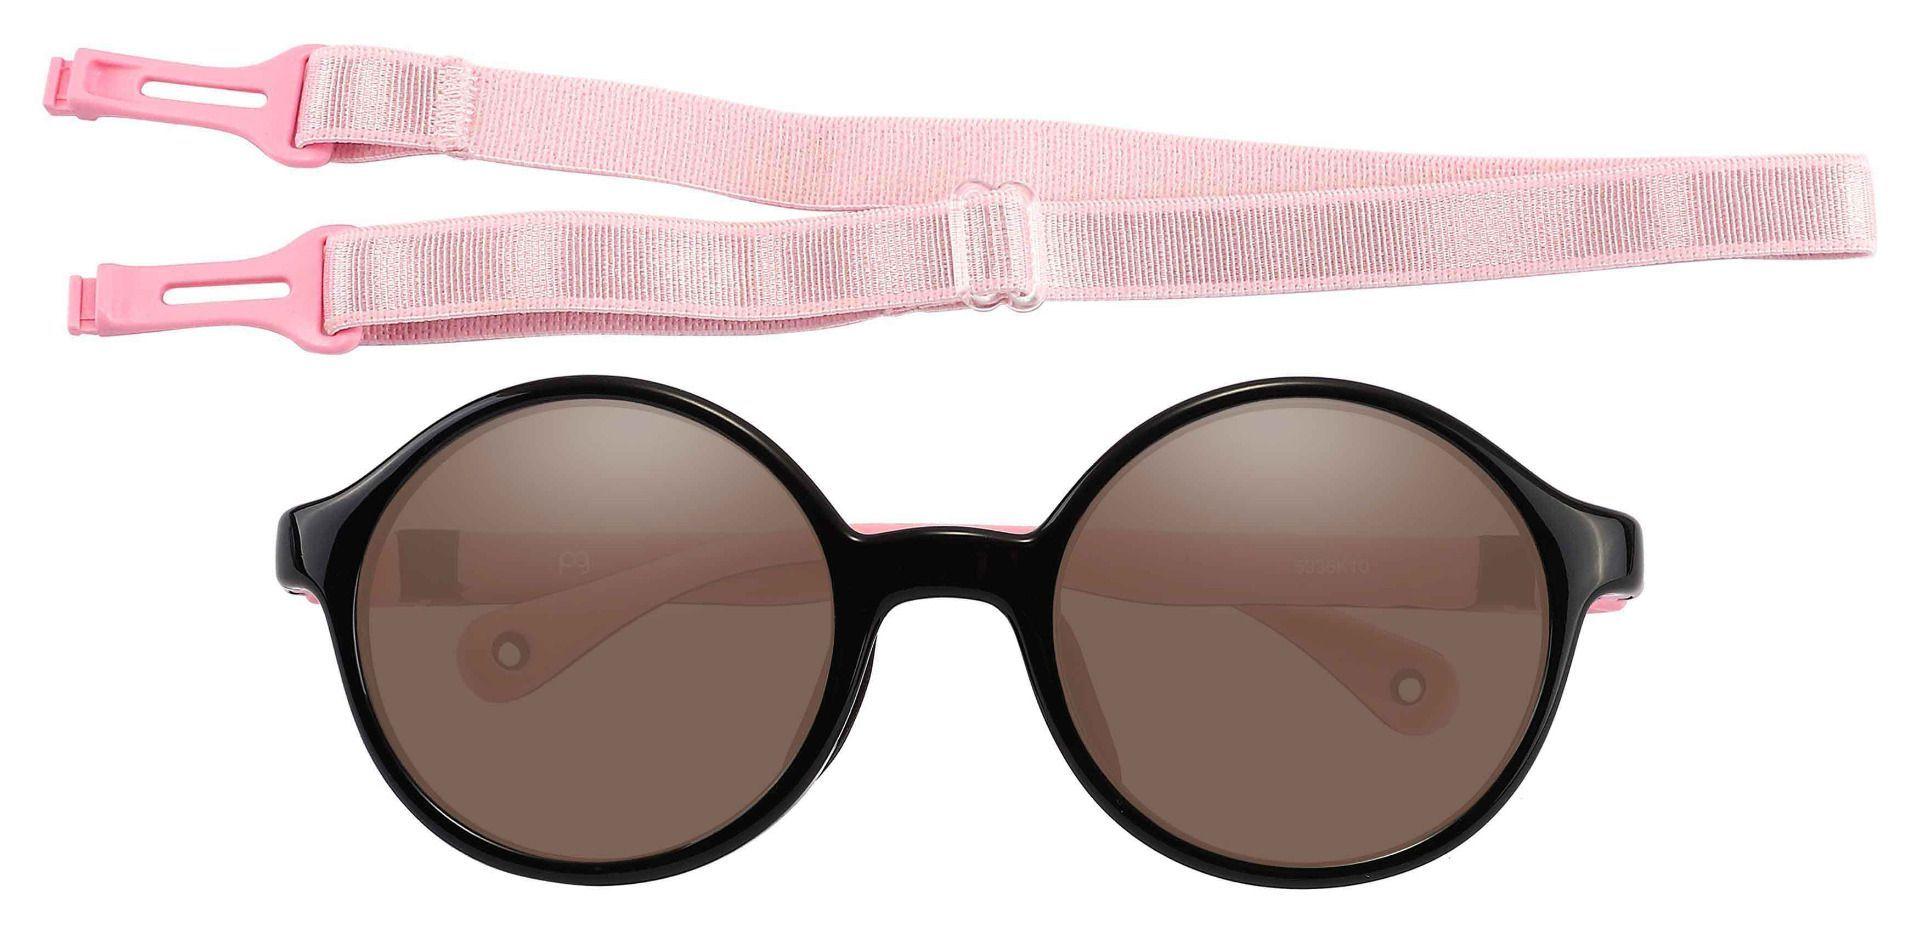 Sammy Round Prescription Sunglasses - Black Frame With Brown Lenses